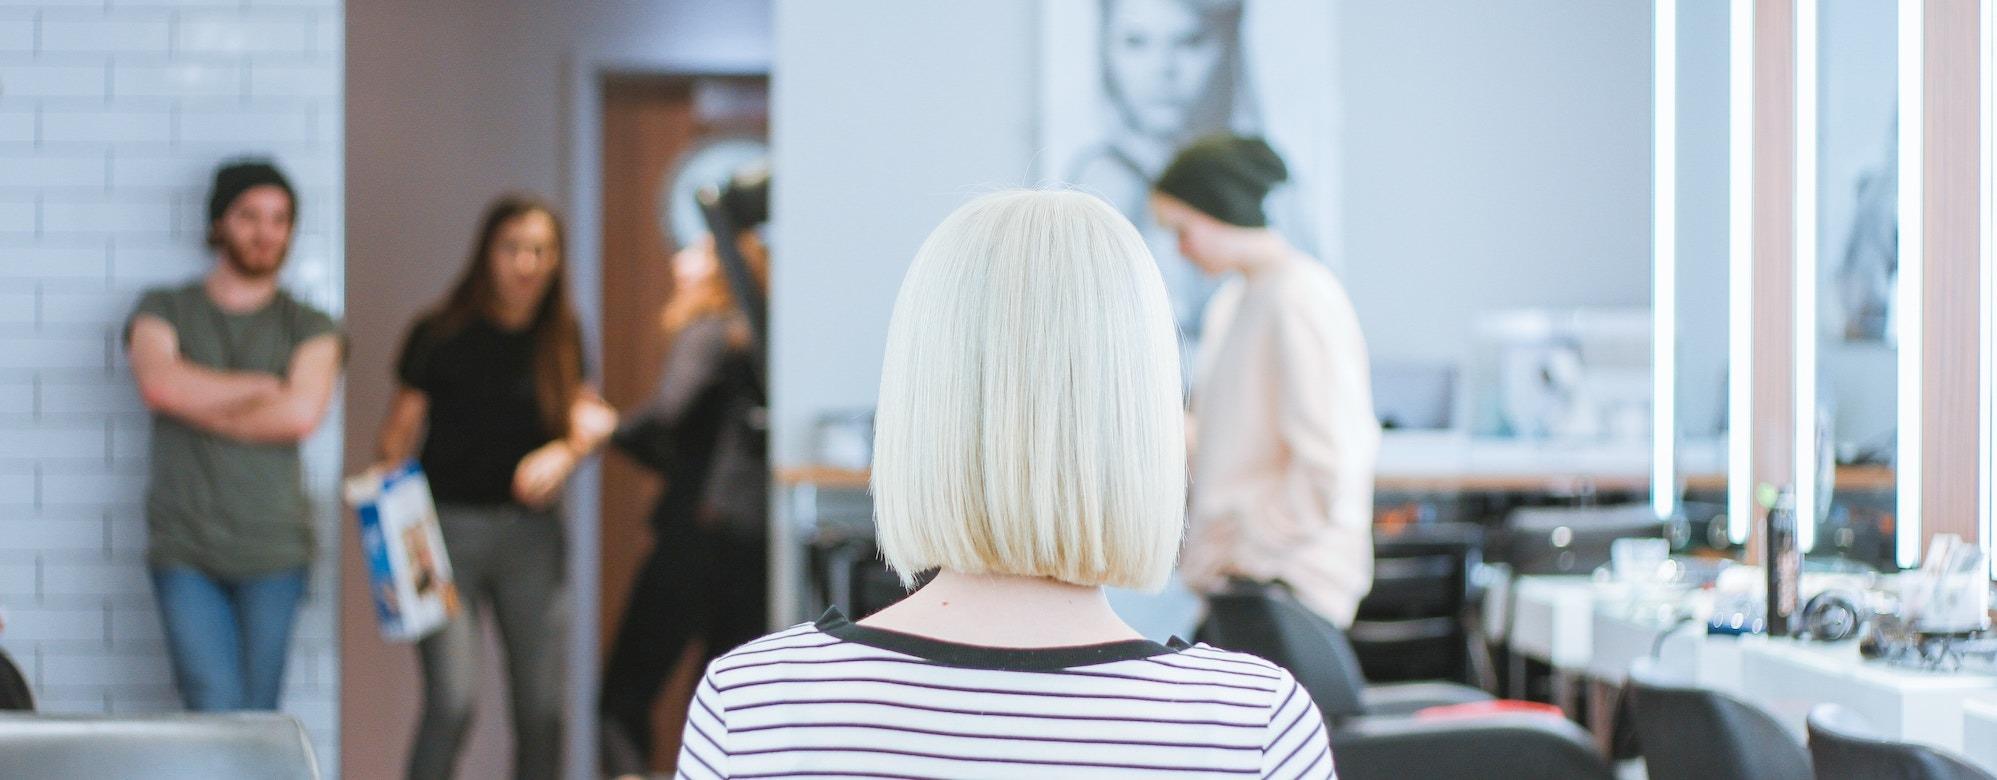 Quanto guadagna un parrucchiere?